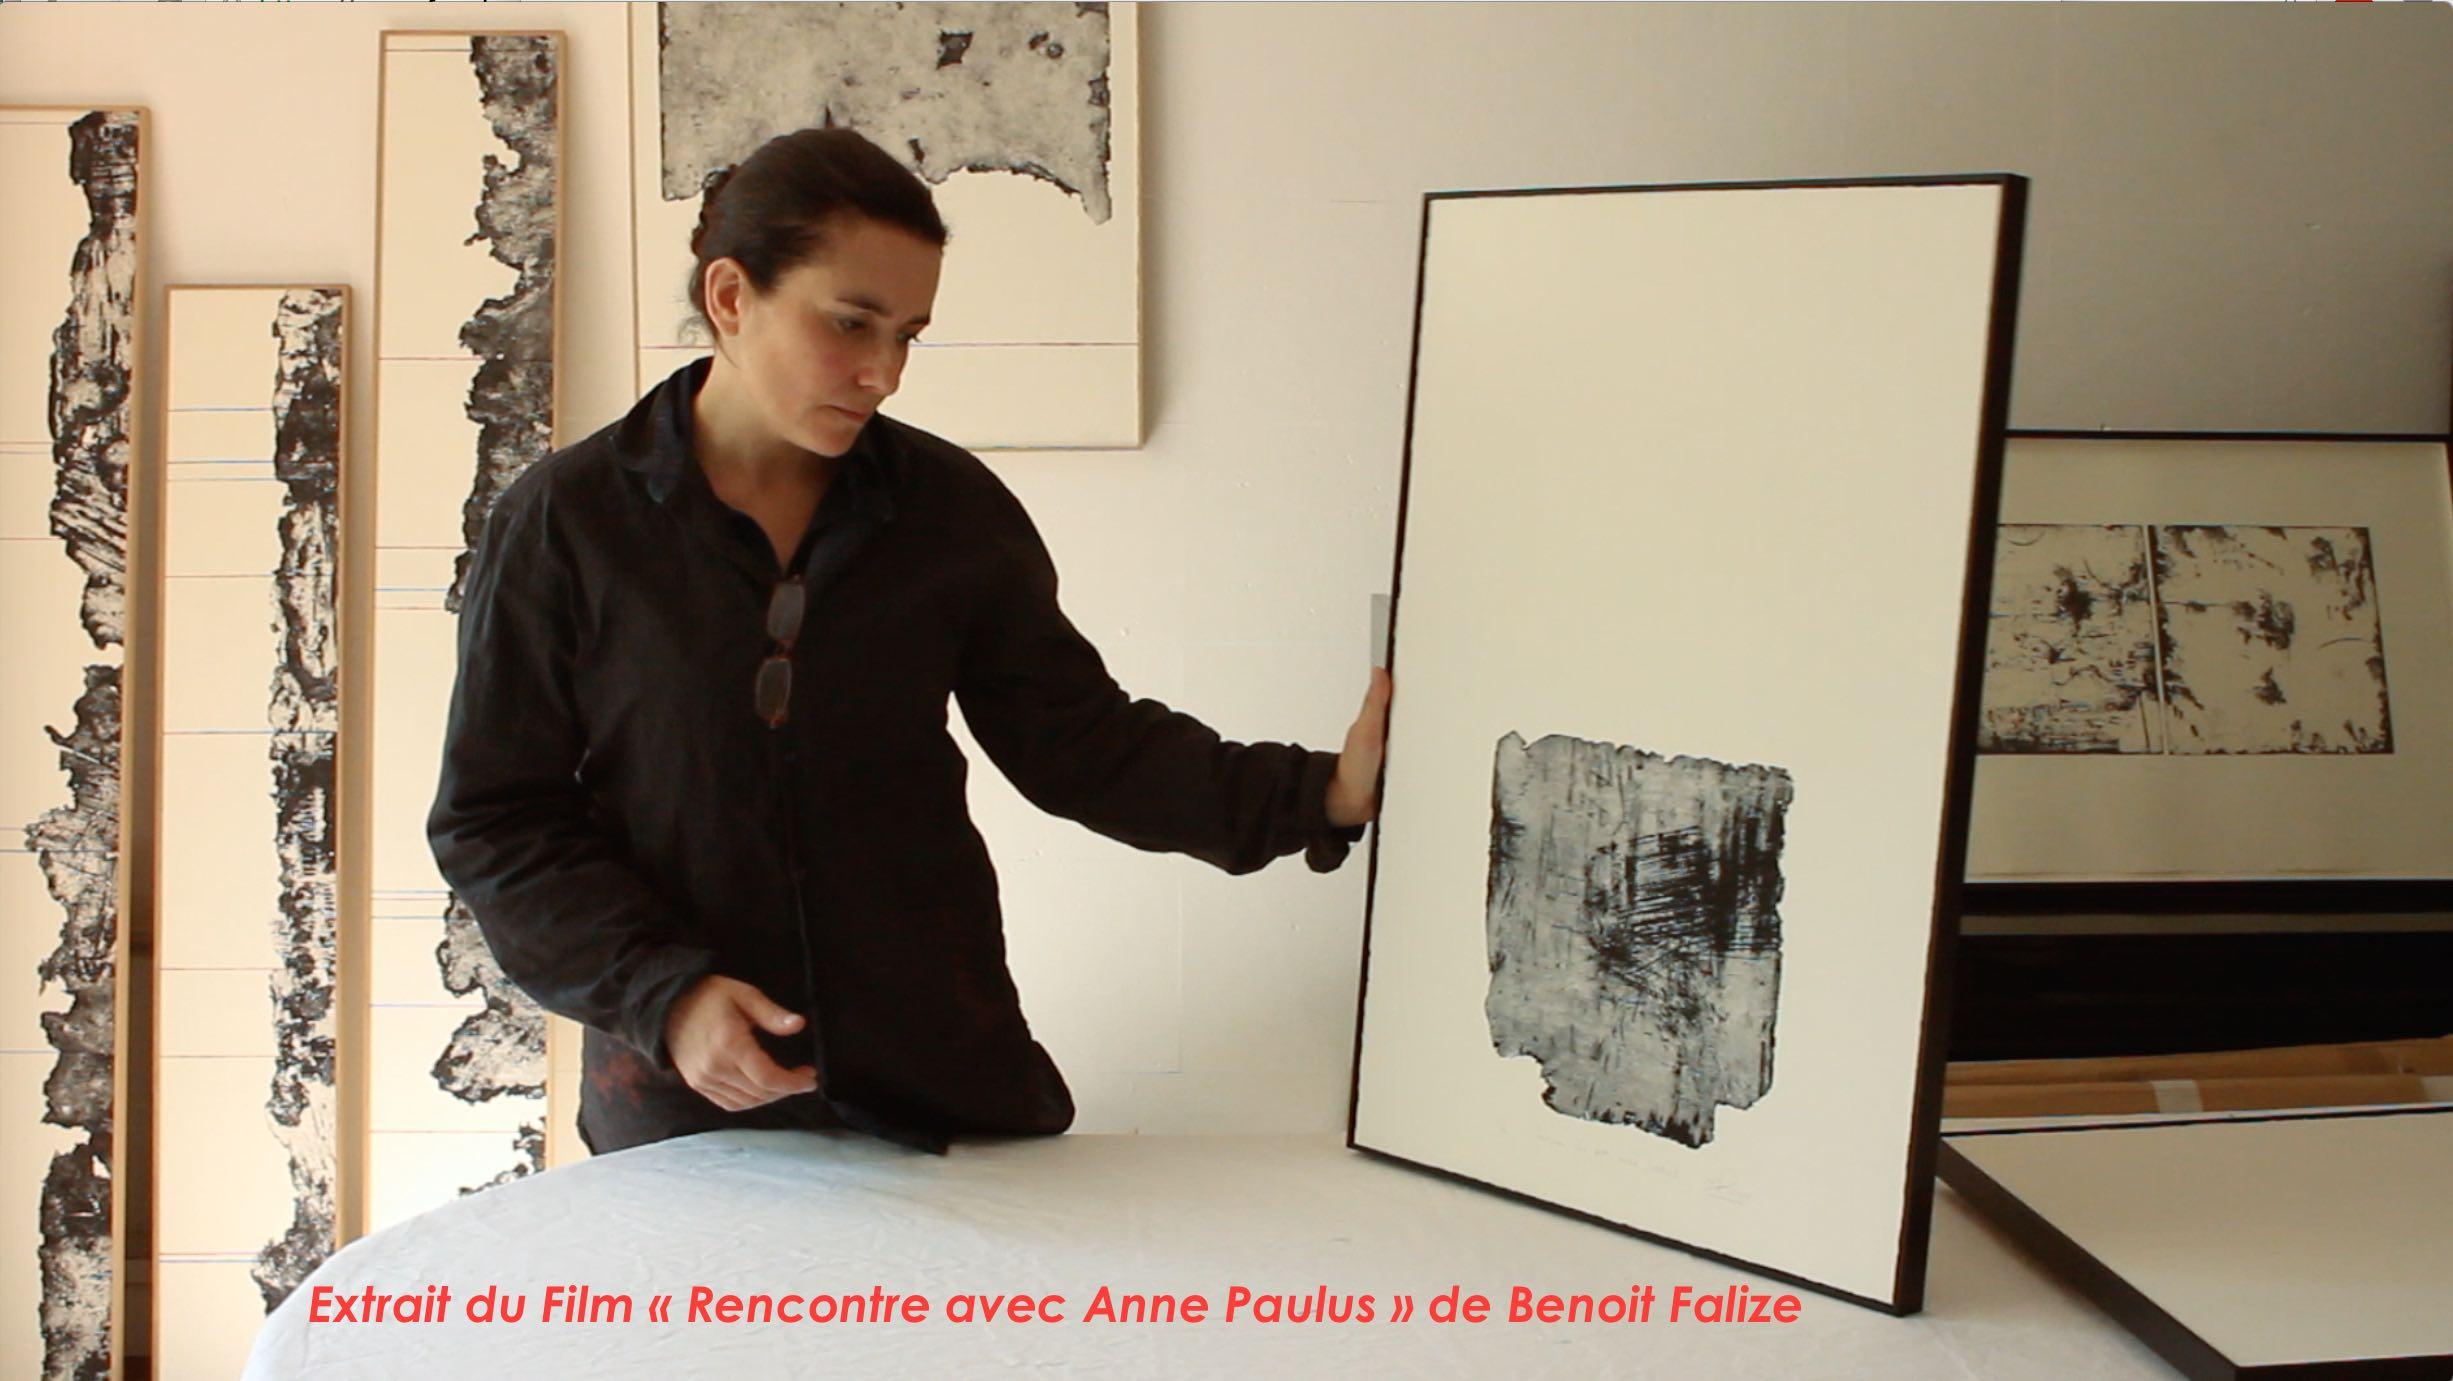 film estampes gravure Benoit Falize